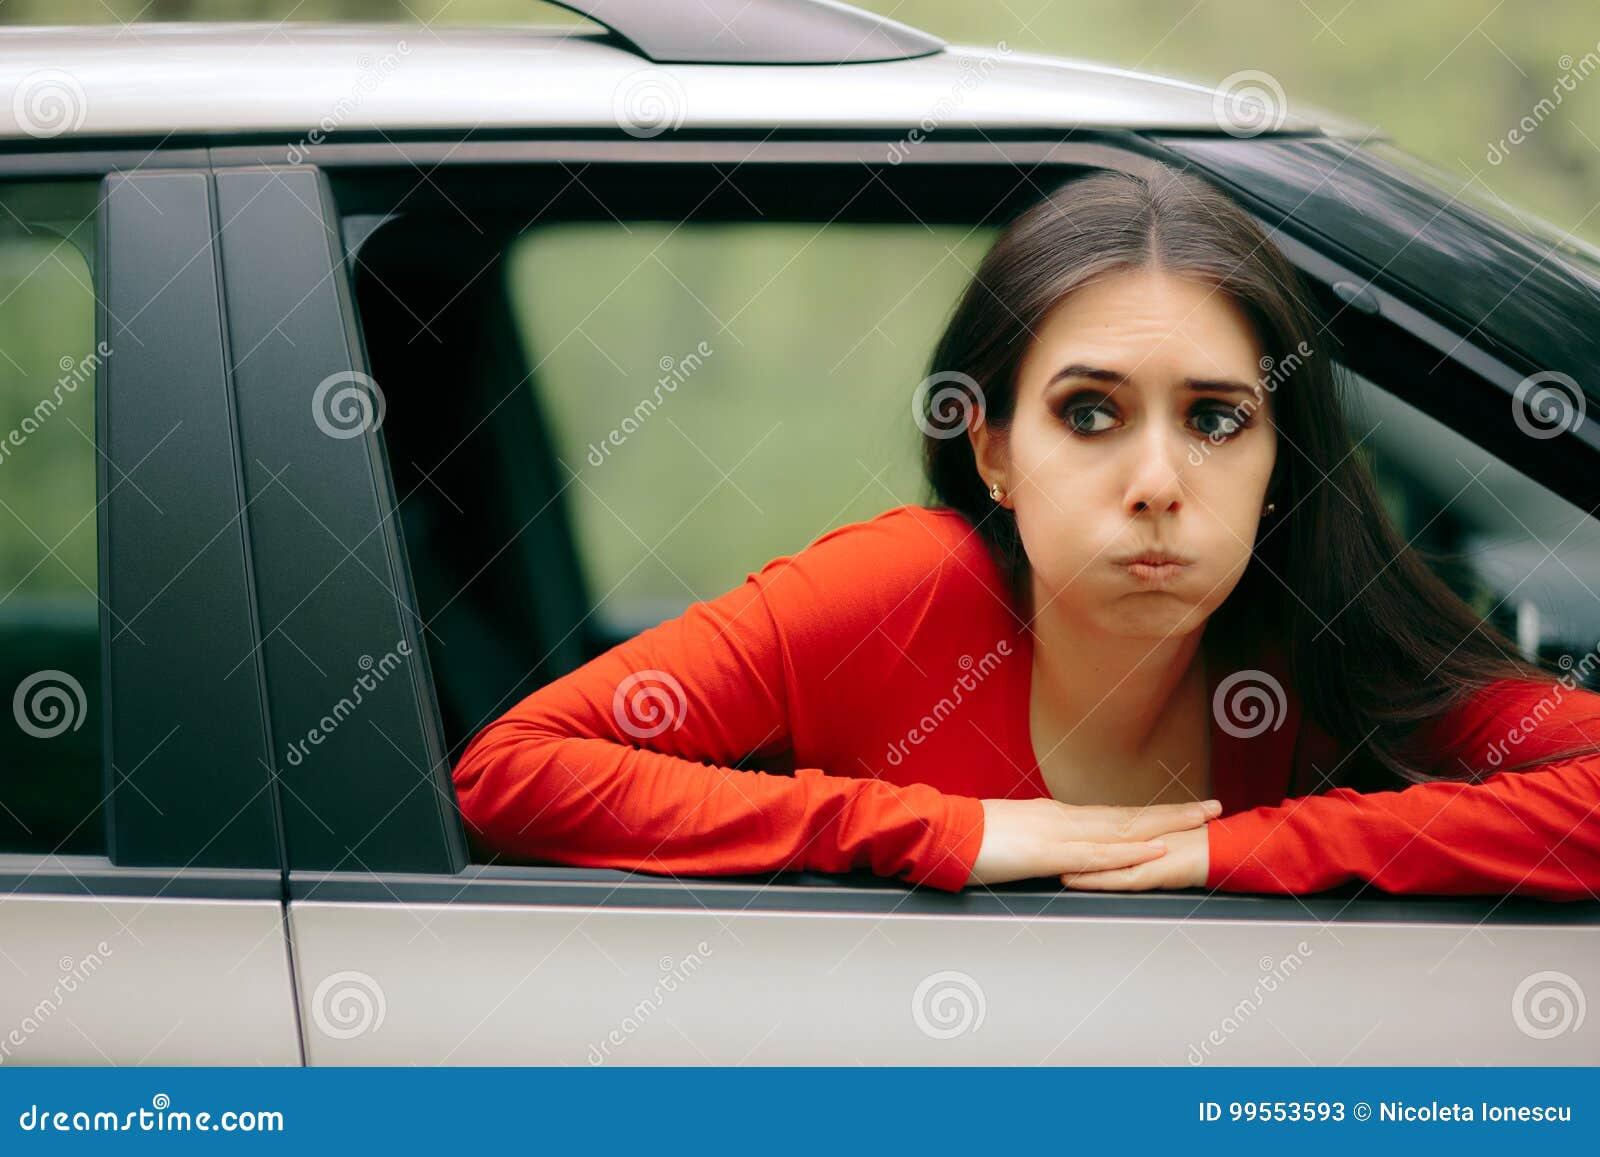 car sick woman having motion sickness symptoms stock image image